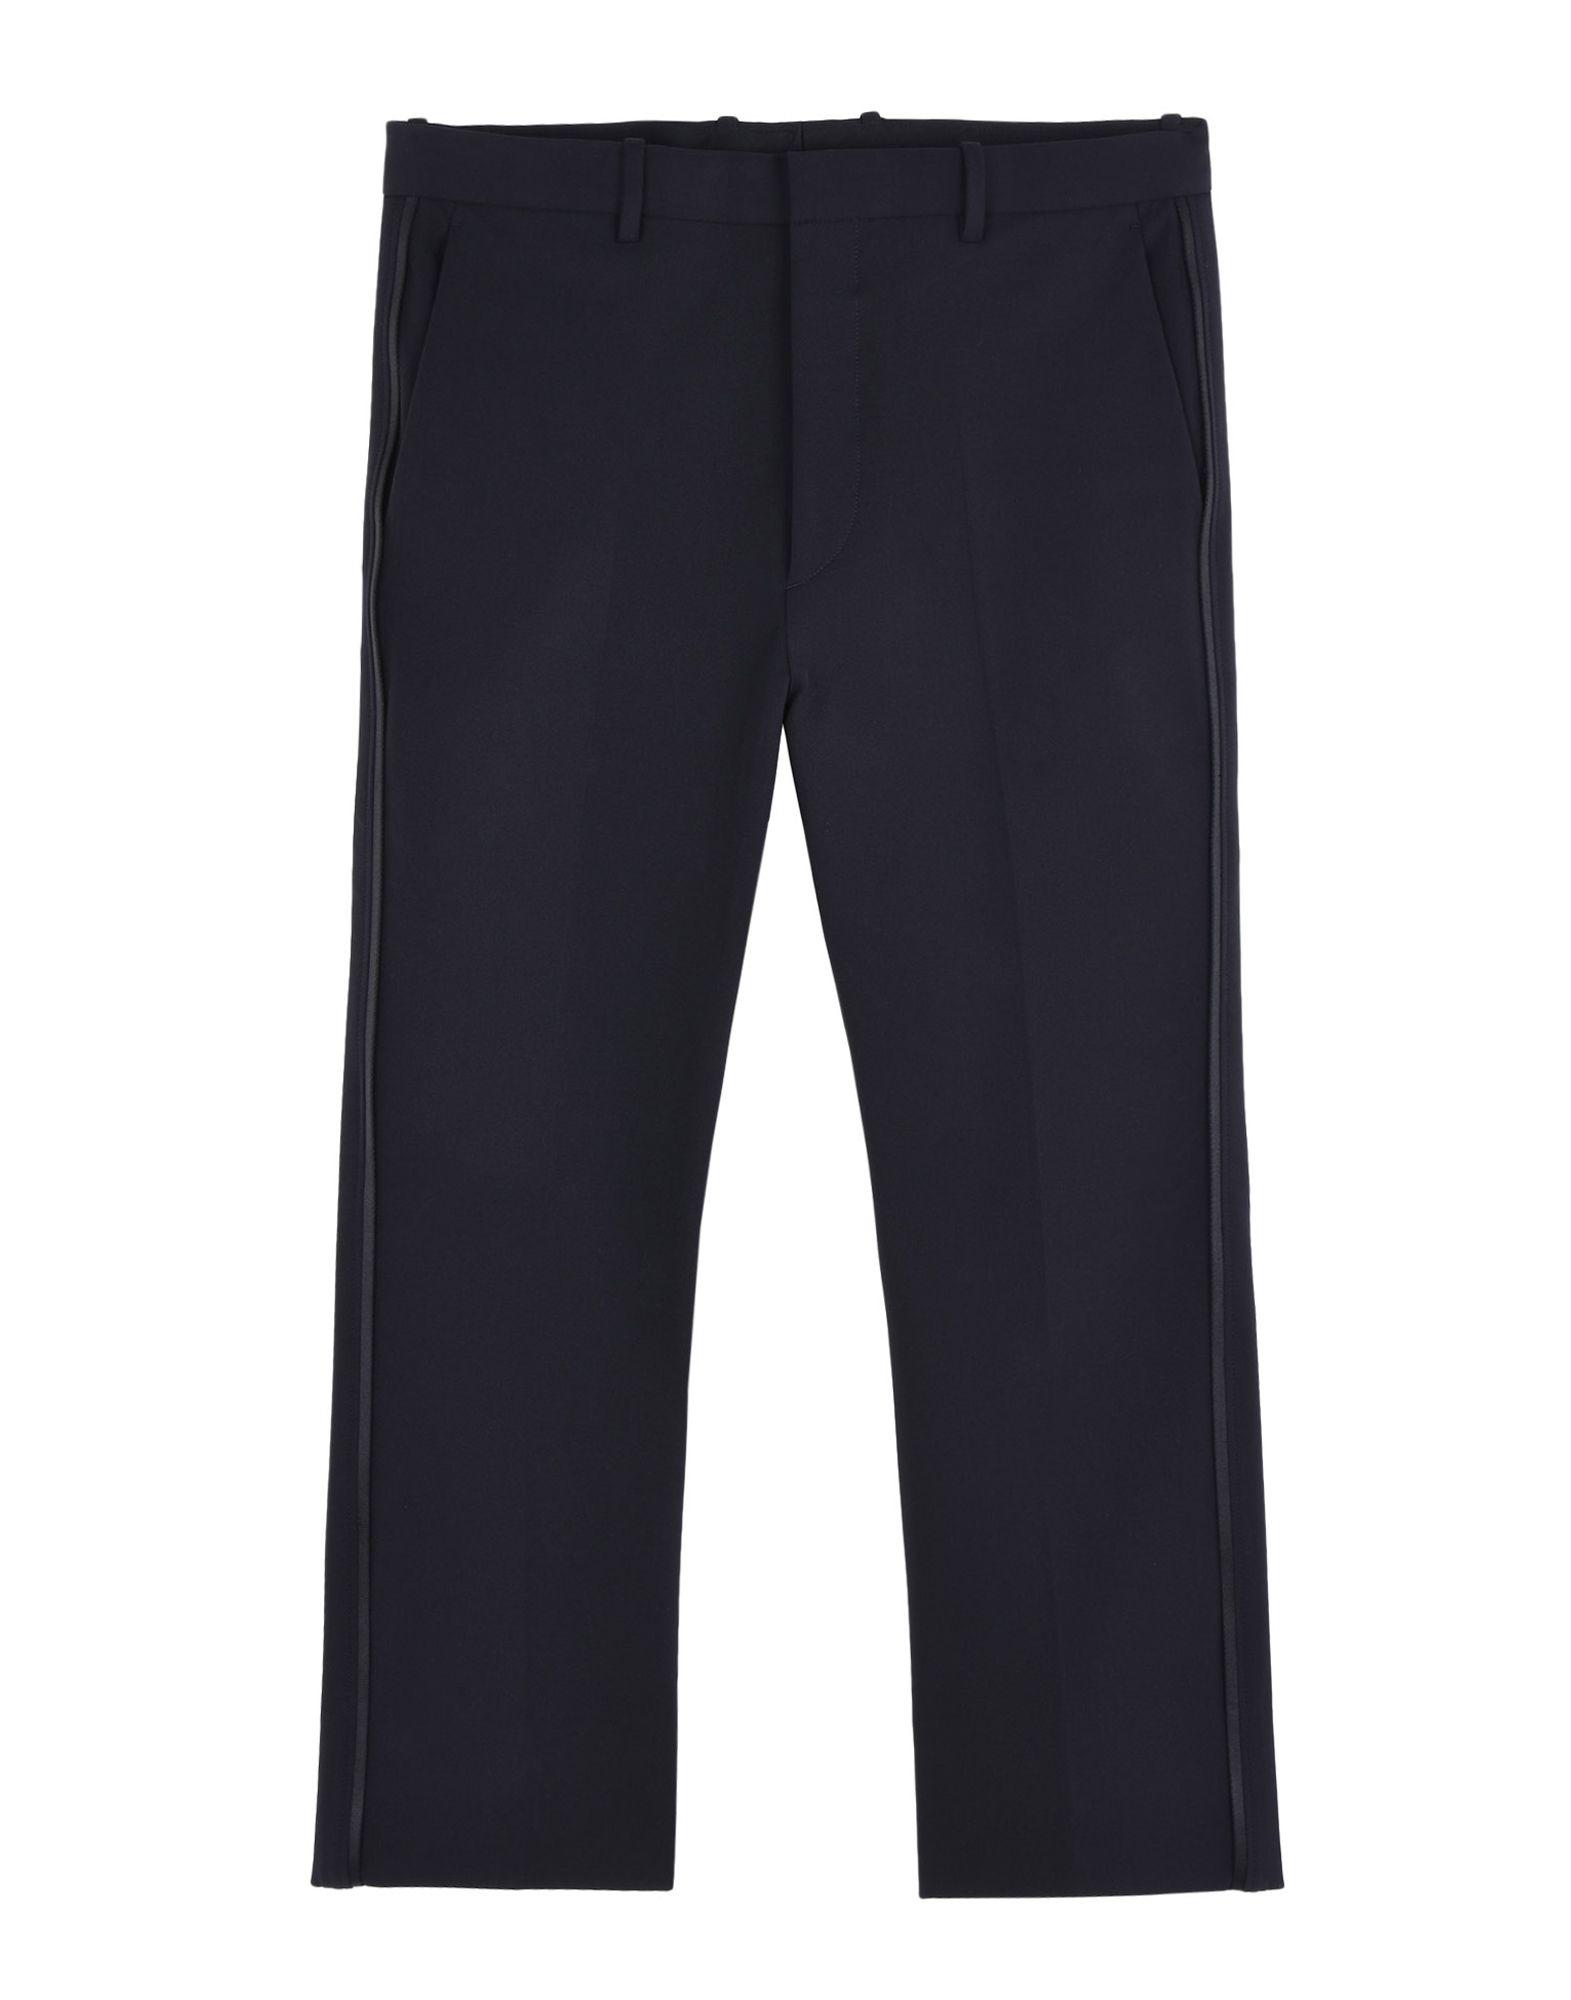 Tailored Trousers - JIL SANDER Online Store